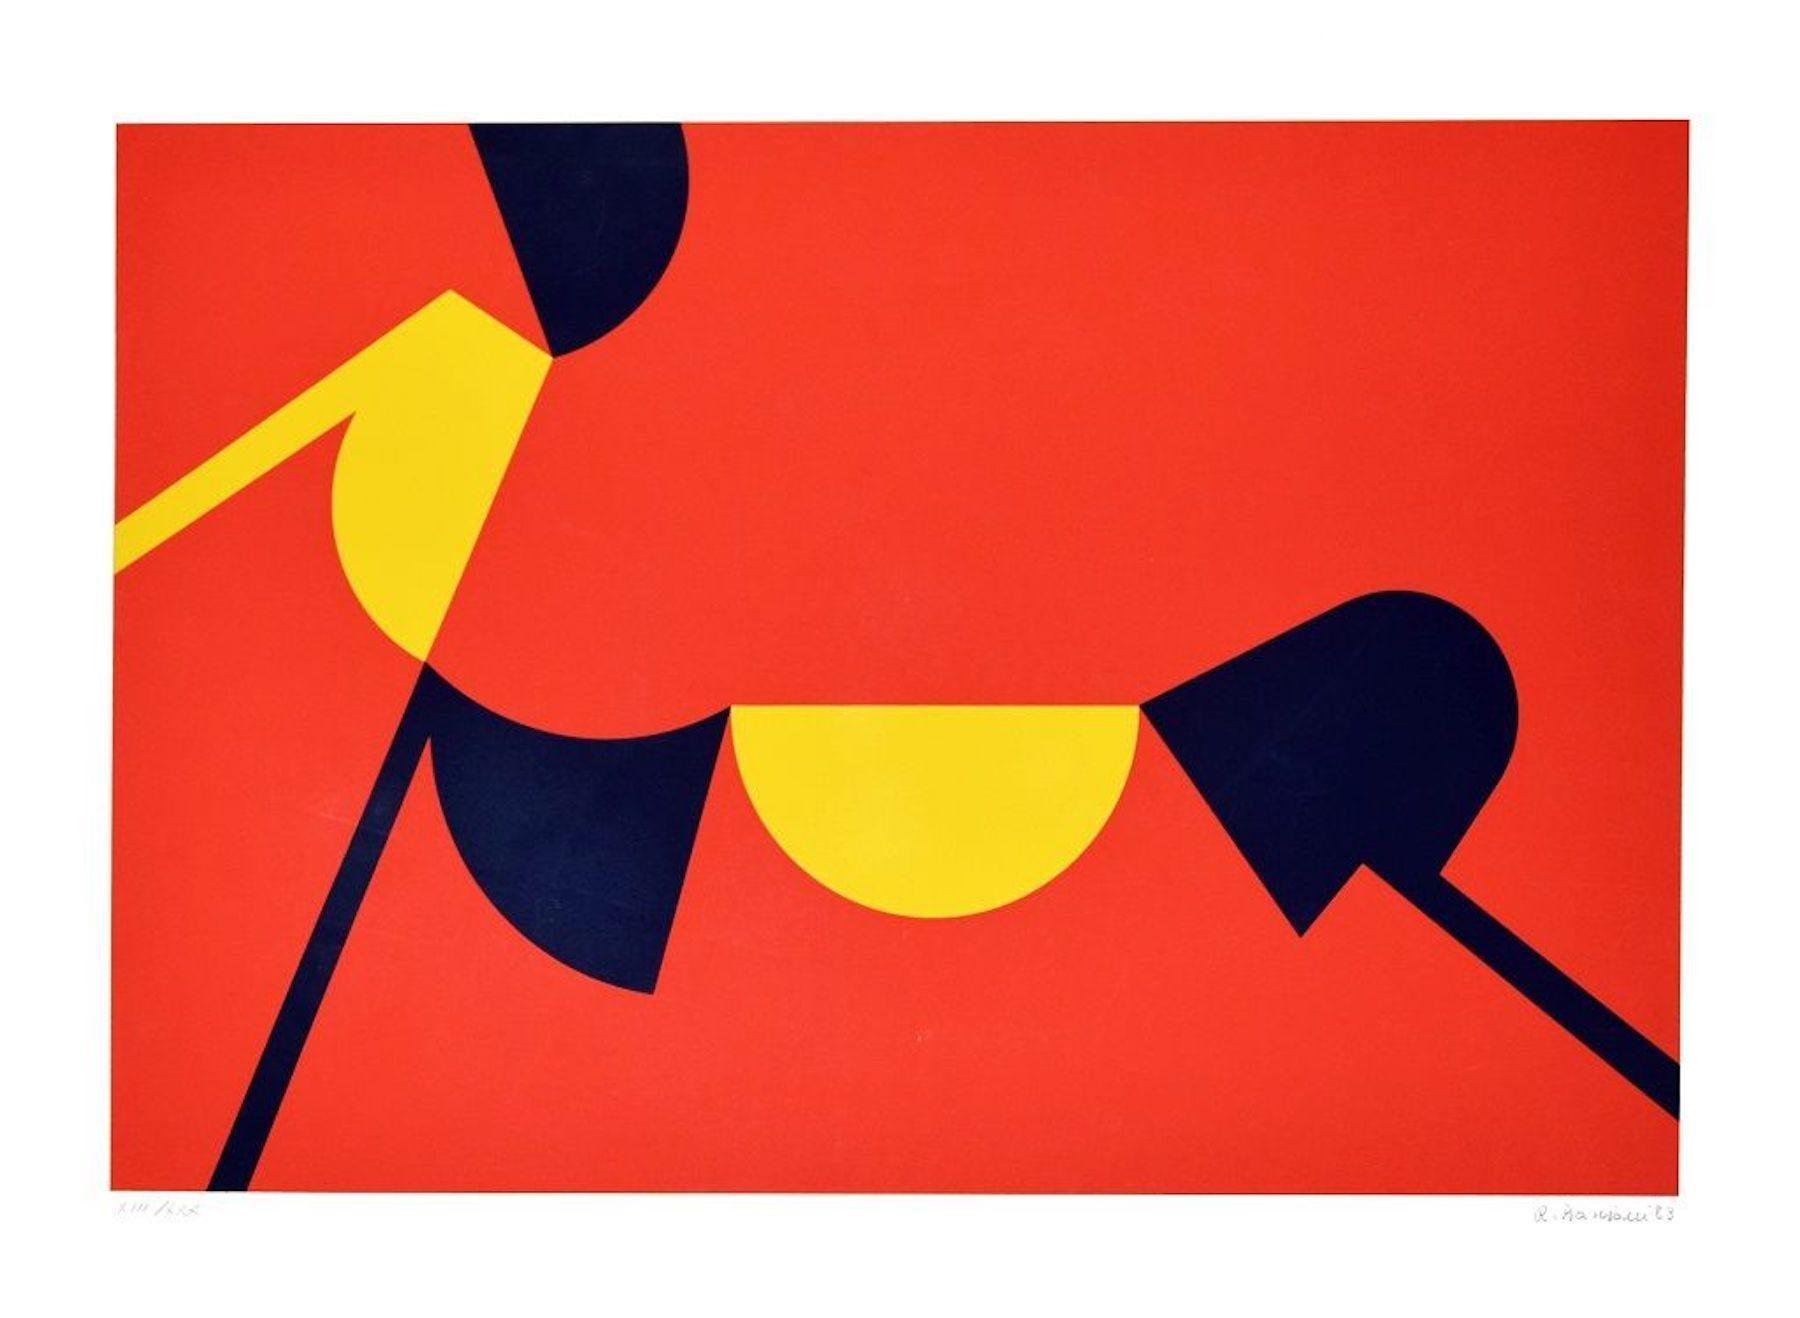 Abstract Sunset - Original Screen Print by Renato Barisani - 1983